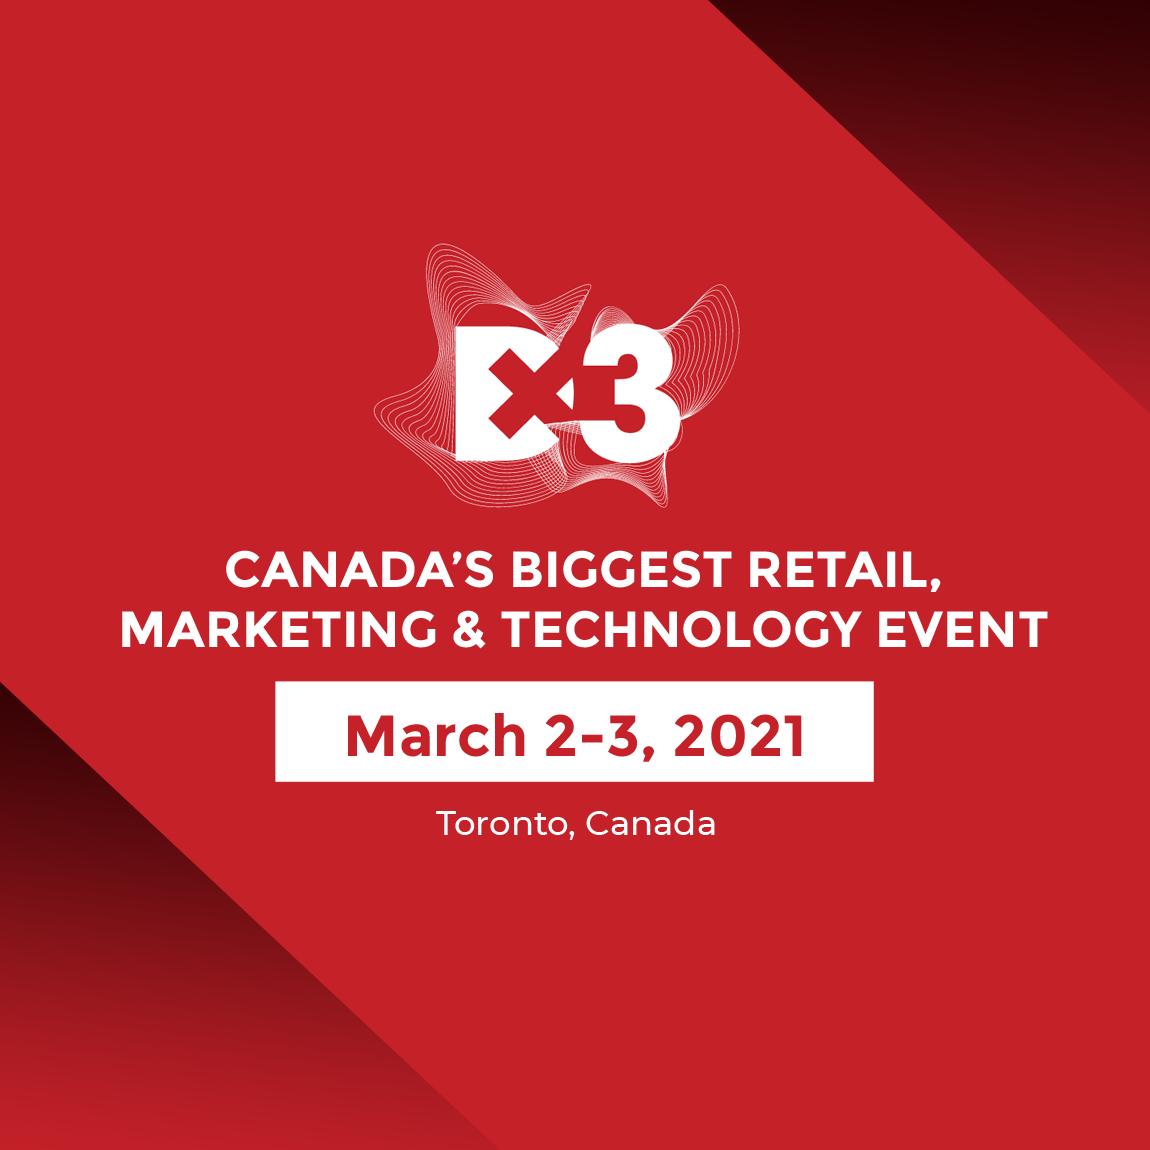 DX3 Canada